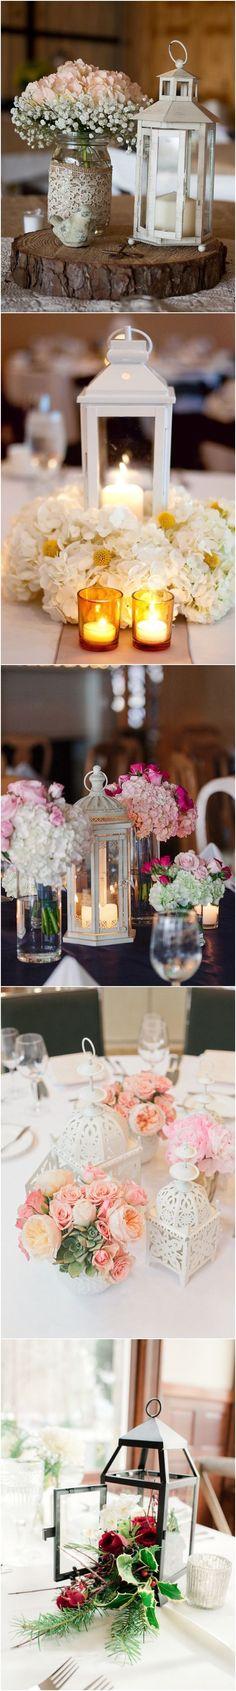 rustic latern wedding centerpieces / http://www.deerpearlflowers.com/wedding-centerpiece-ideas/